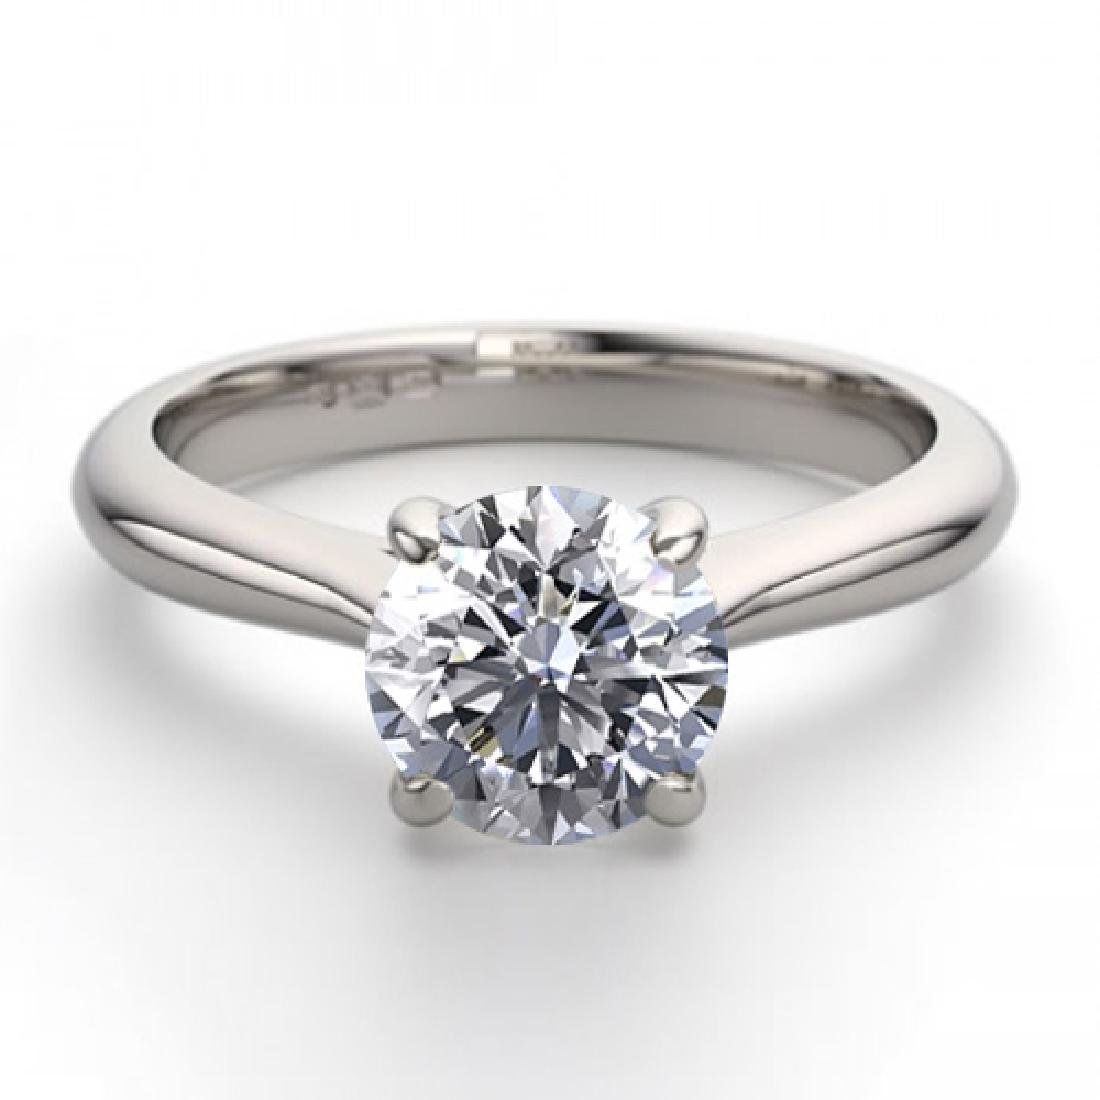 14K White Gold Jewelry 1.13 ctw Natural Diamond